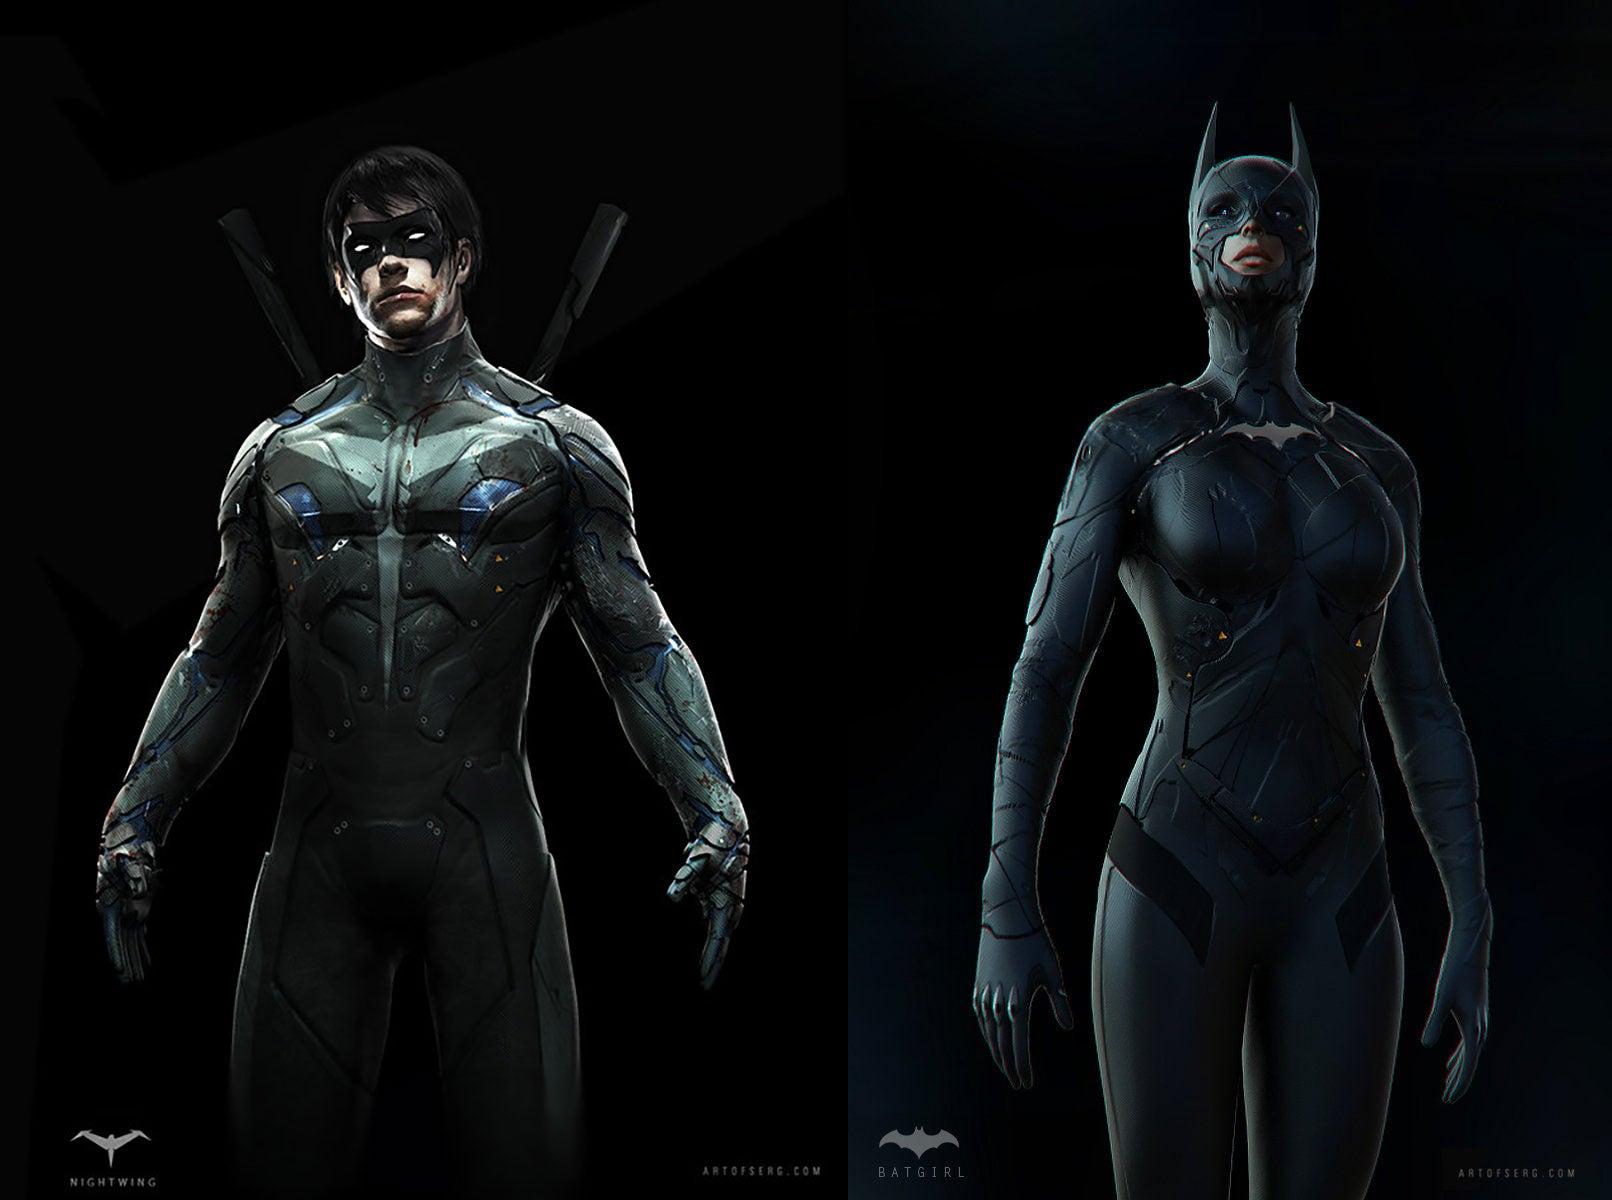 Designing Batgirl To Fit Chris Nolan's Batman Movies